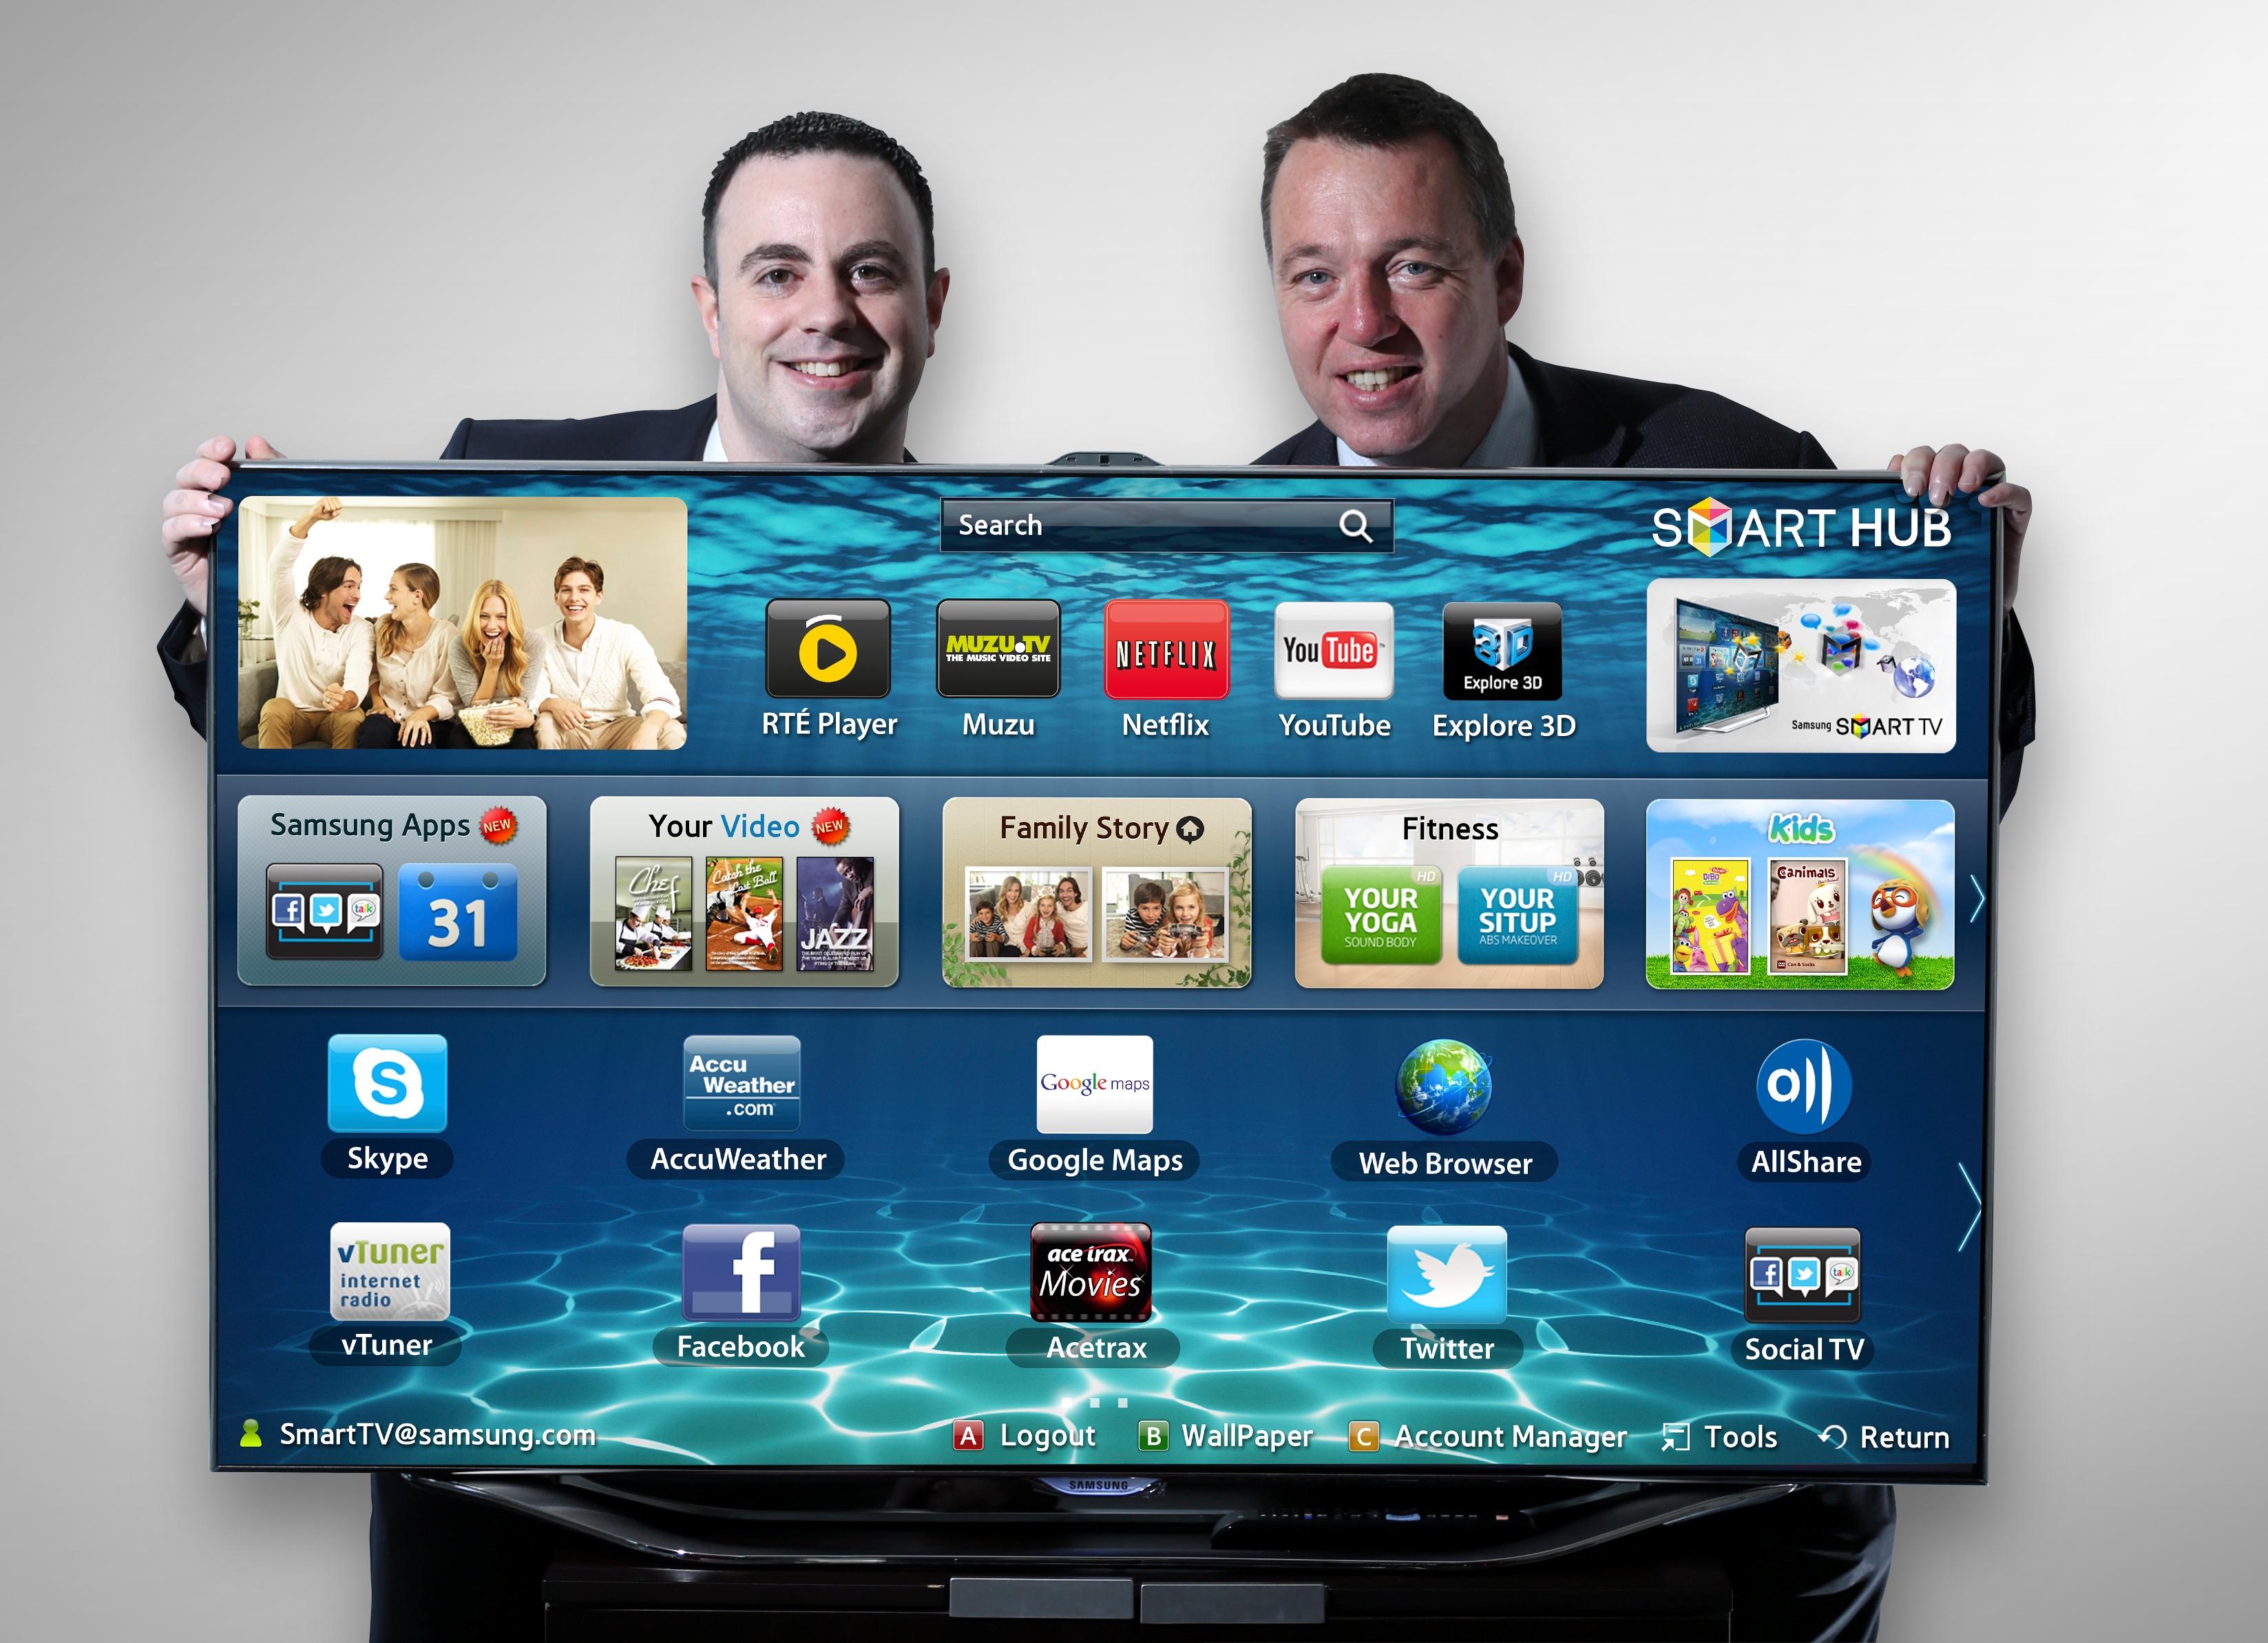 RTÉ Player on Samsung Smart TVs